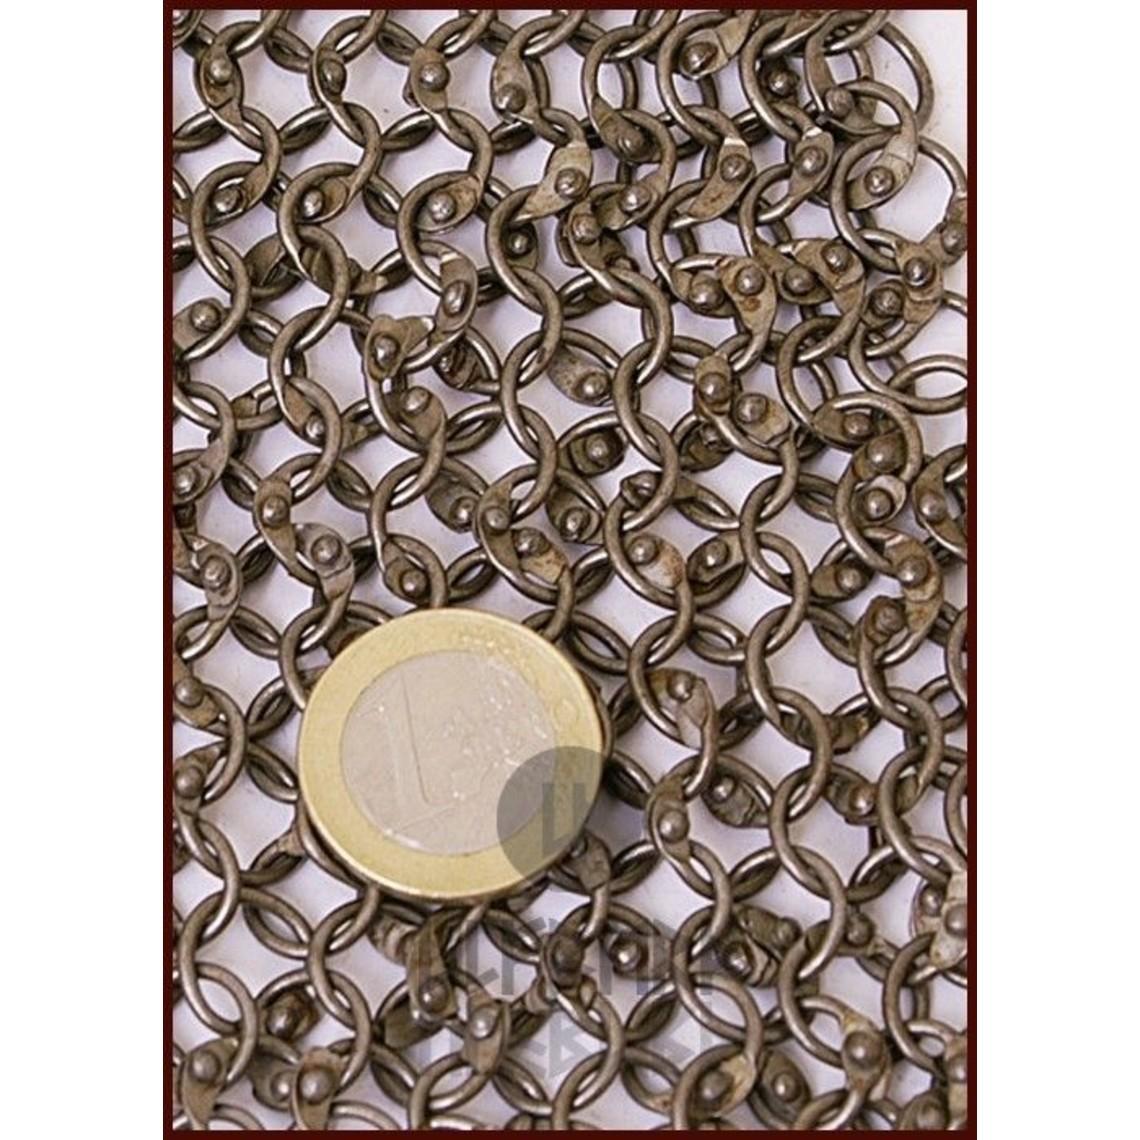 Ulfberth Cofia con cuello cuadrado, anillos redondos - remaches redondos, 8 mm